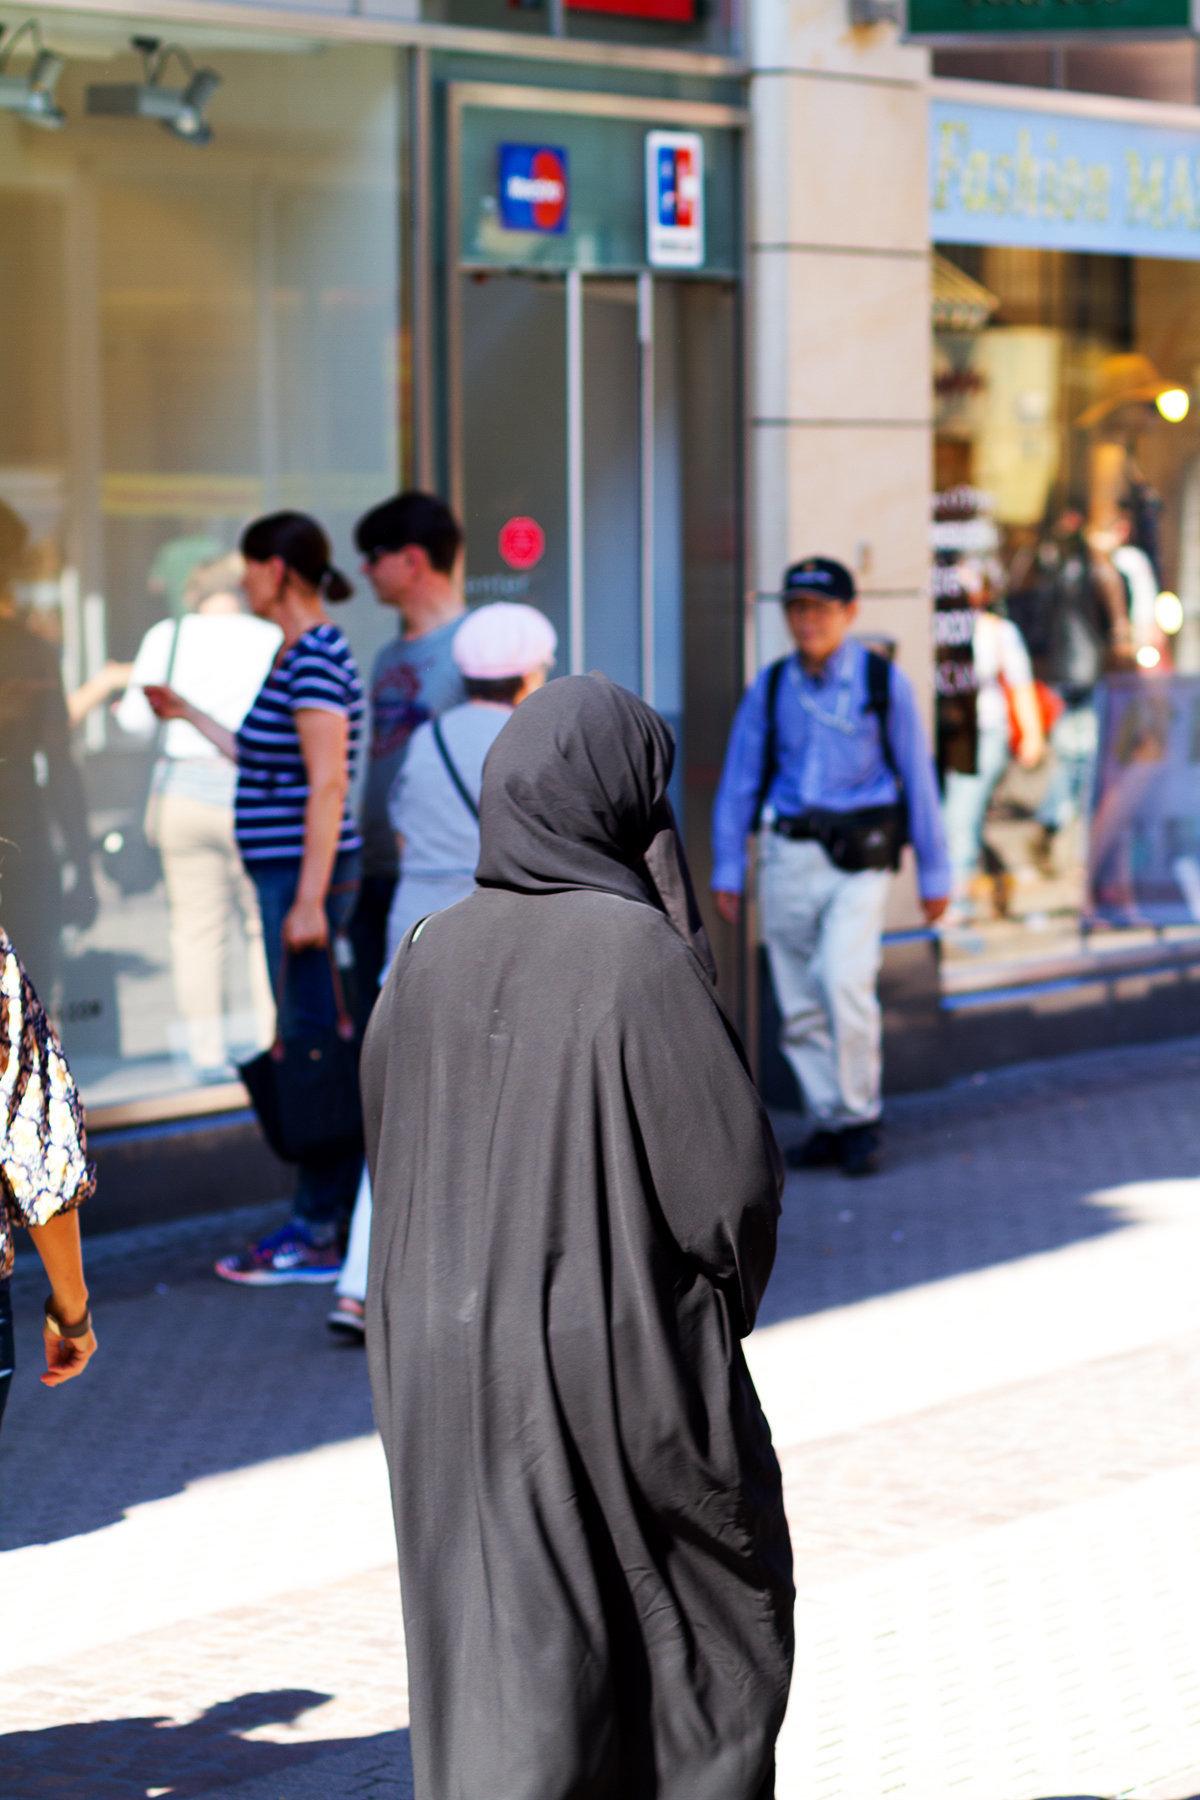 Berlin: Frau beleidigt Muslimin und reißt ihr die Burka vom Kopf